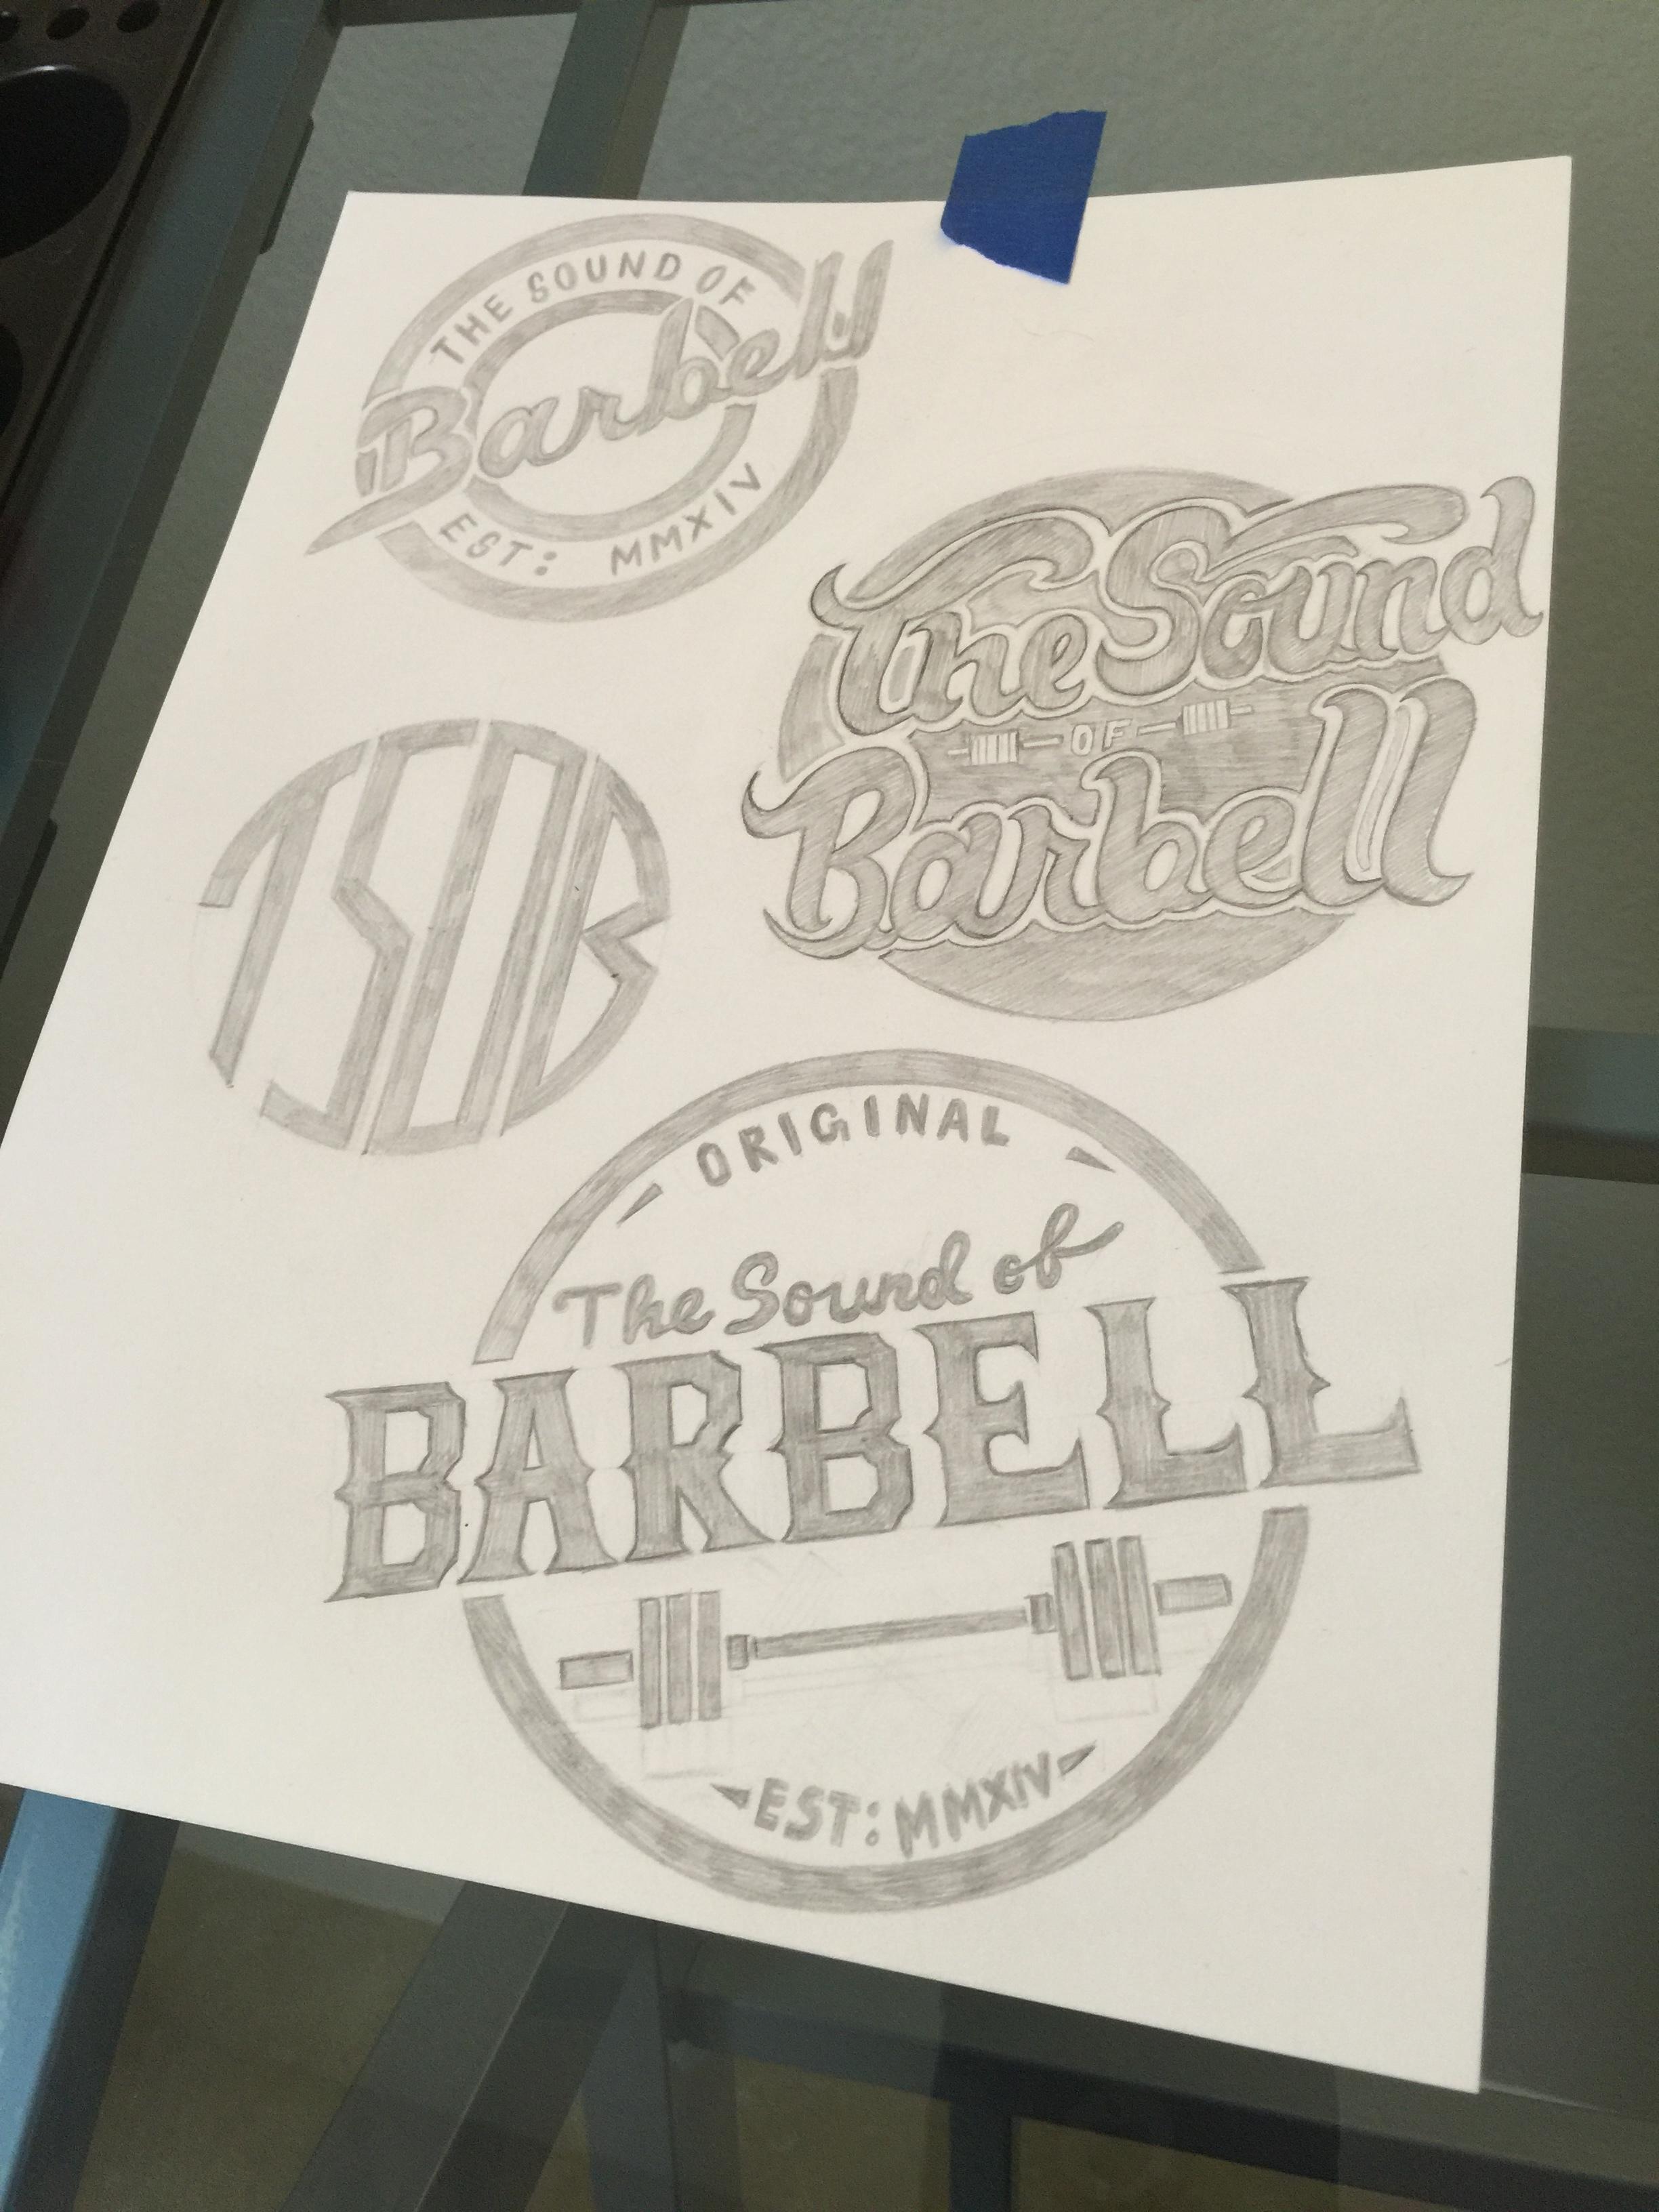 tsob-thesoundofbarbell-logo-brand-branding-black-white-vector-design-graphic-graphicdesign-lasvegas-graphicdesigner-vector-handtype-handletter-logos-minimal-roughs-sketches-sketch.jpg